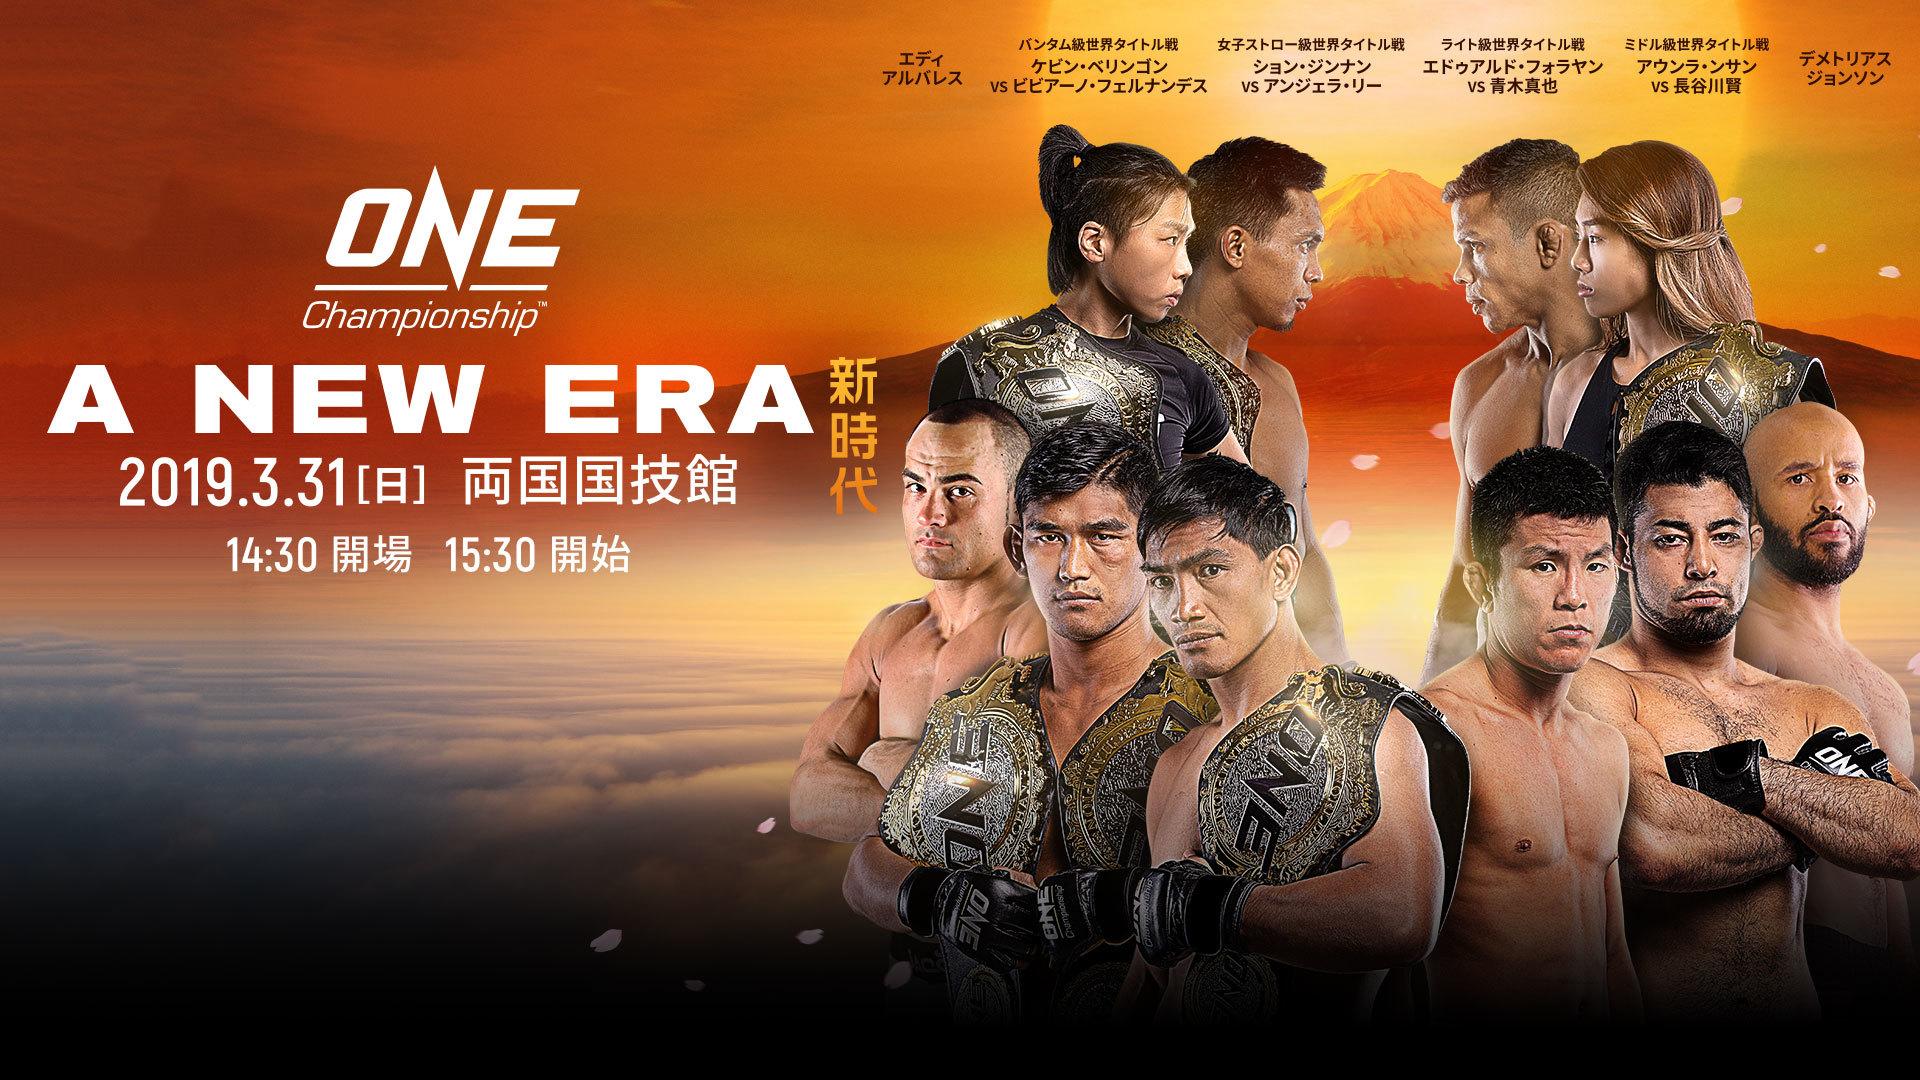 『ONE: A NEW ERA -新時代-』は3月31日(日)、東京の両国国技館で開催